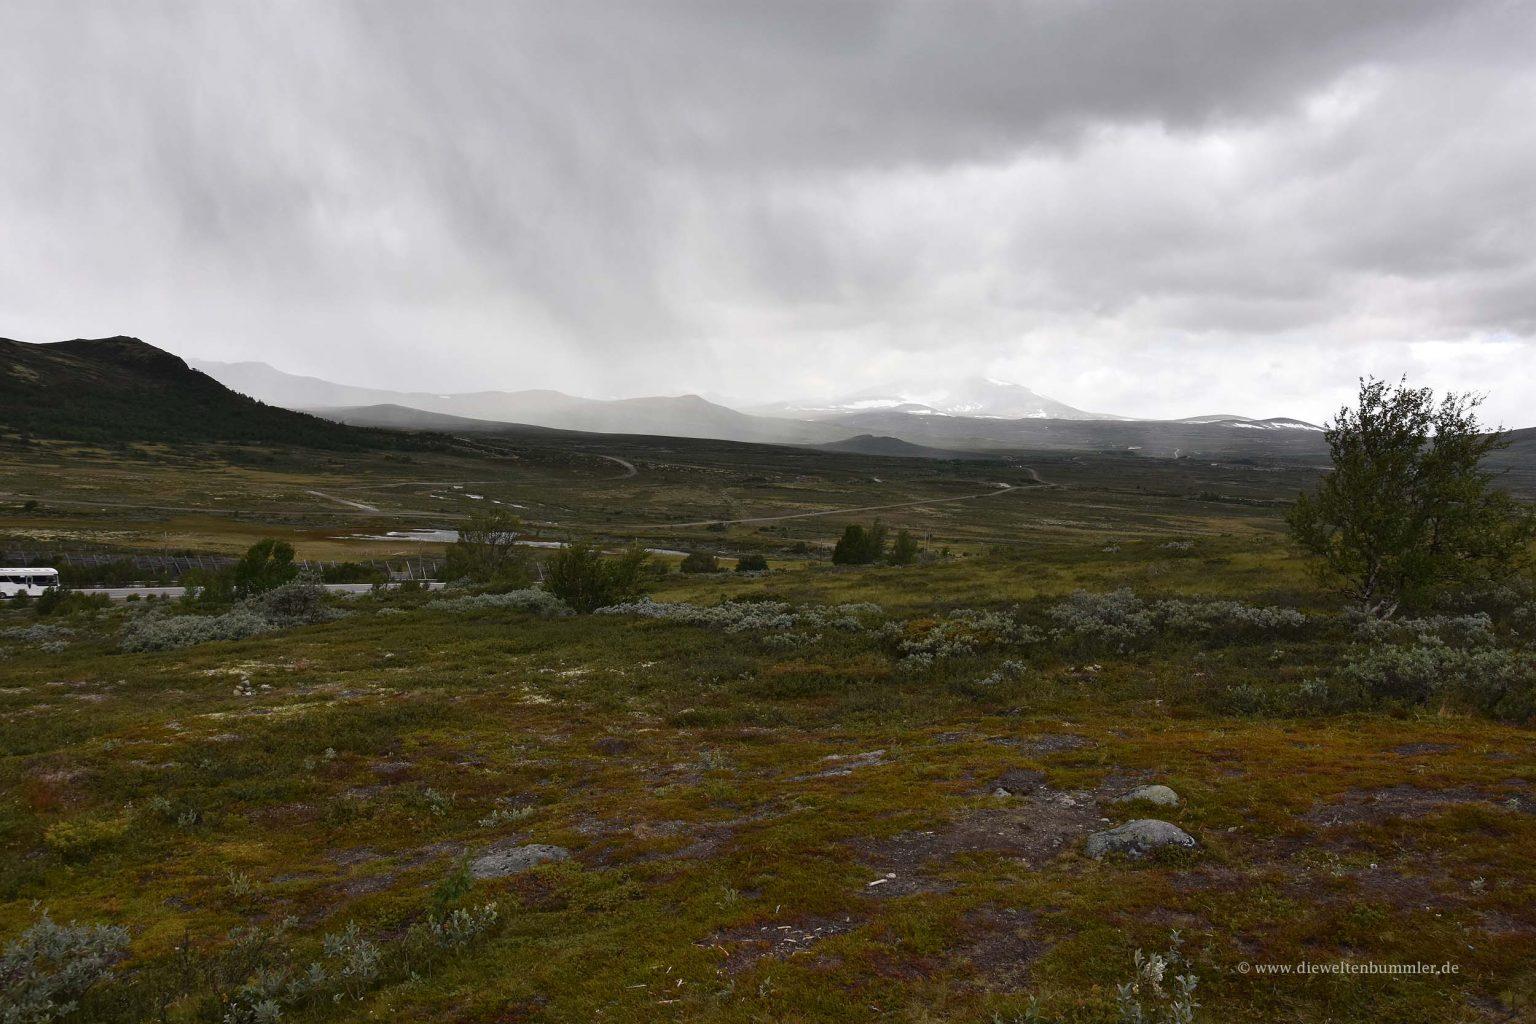 Durchquerung des Dovrefjell-Nationalparks